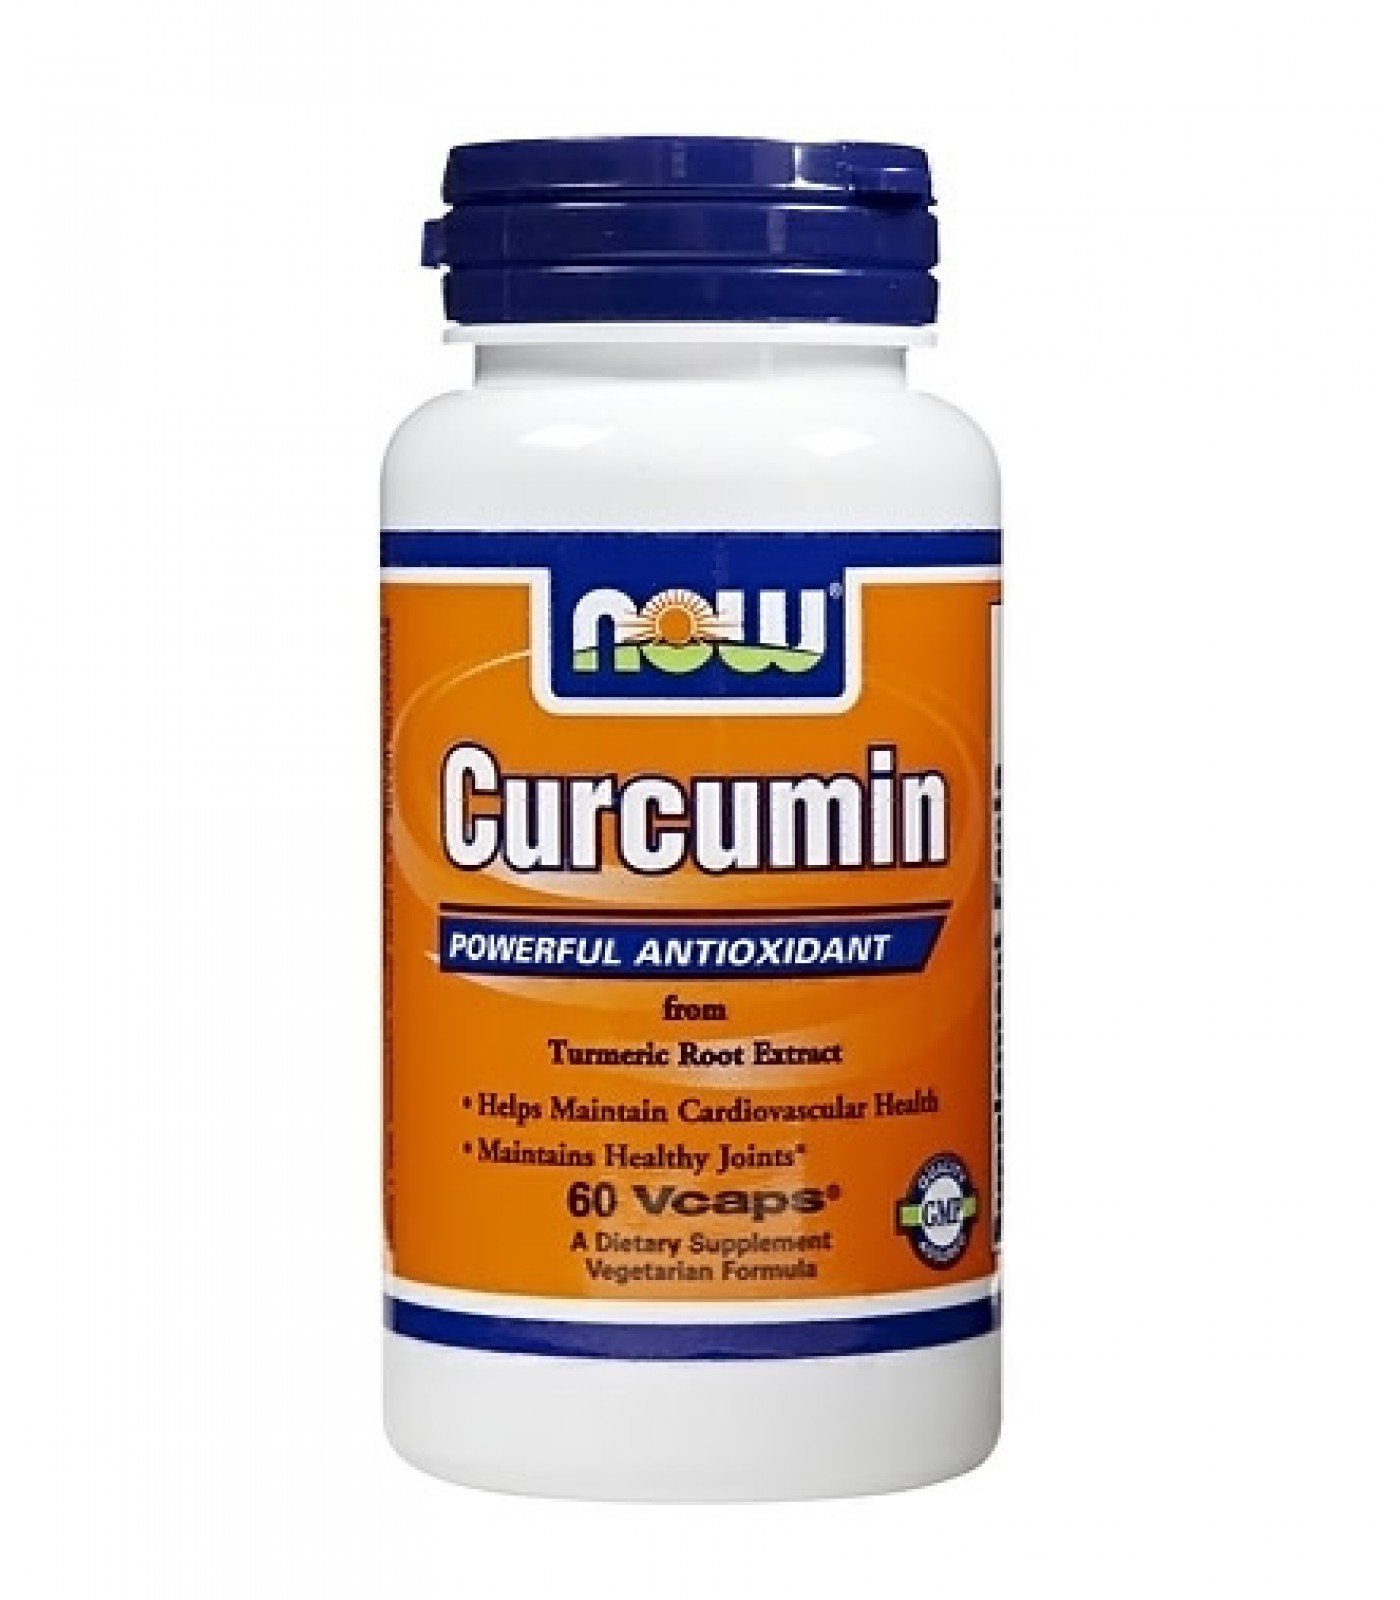 NOW - Curcumin 665mg. / 60 VCaps.